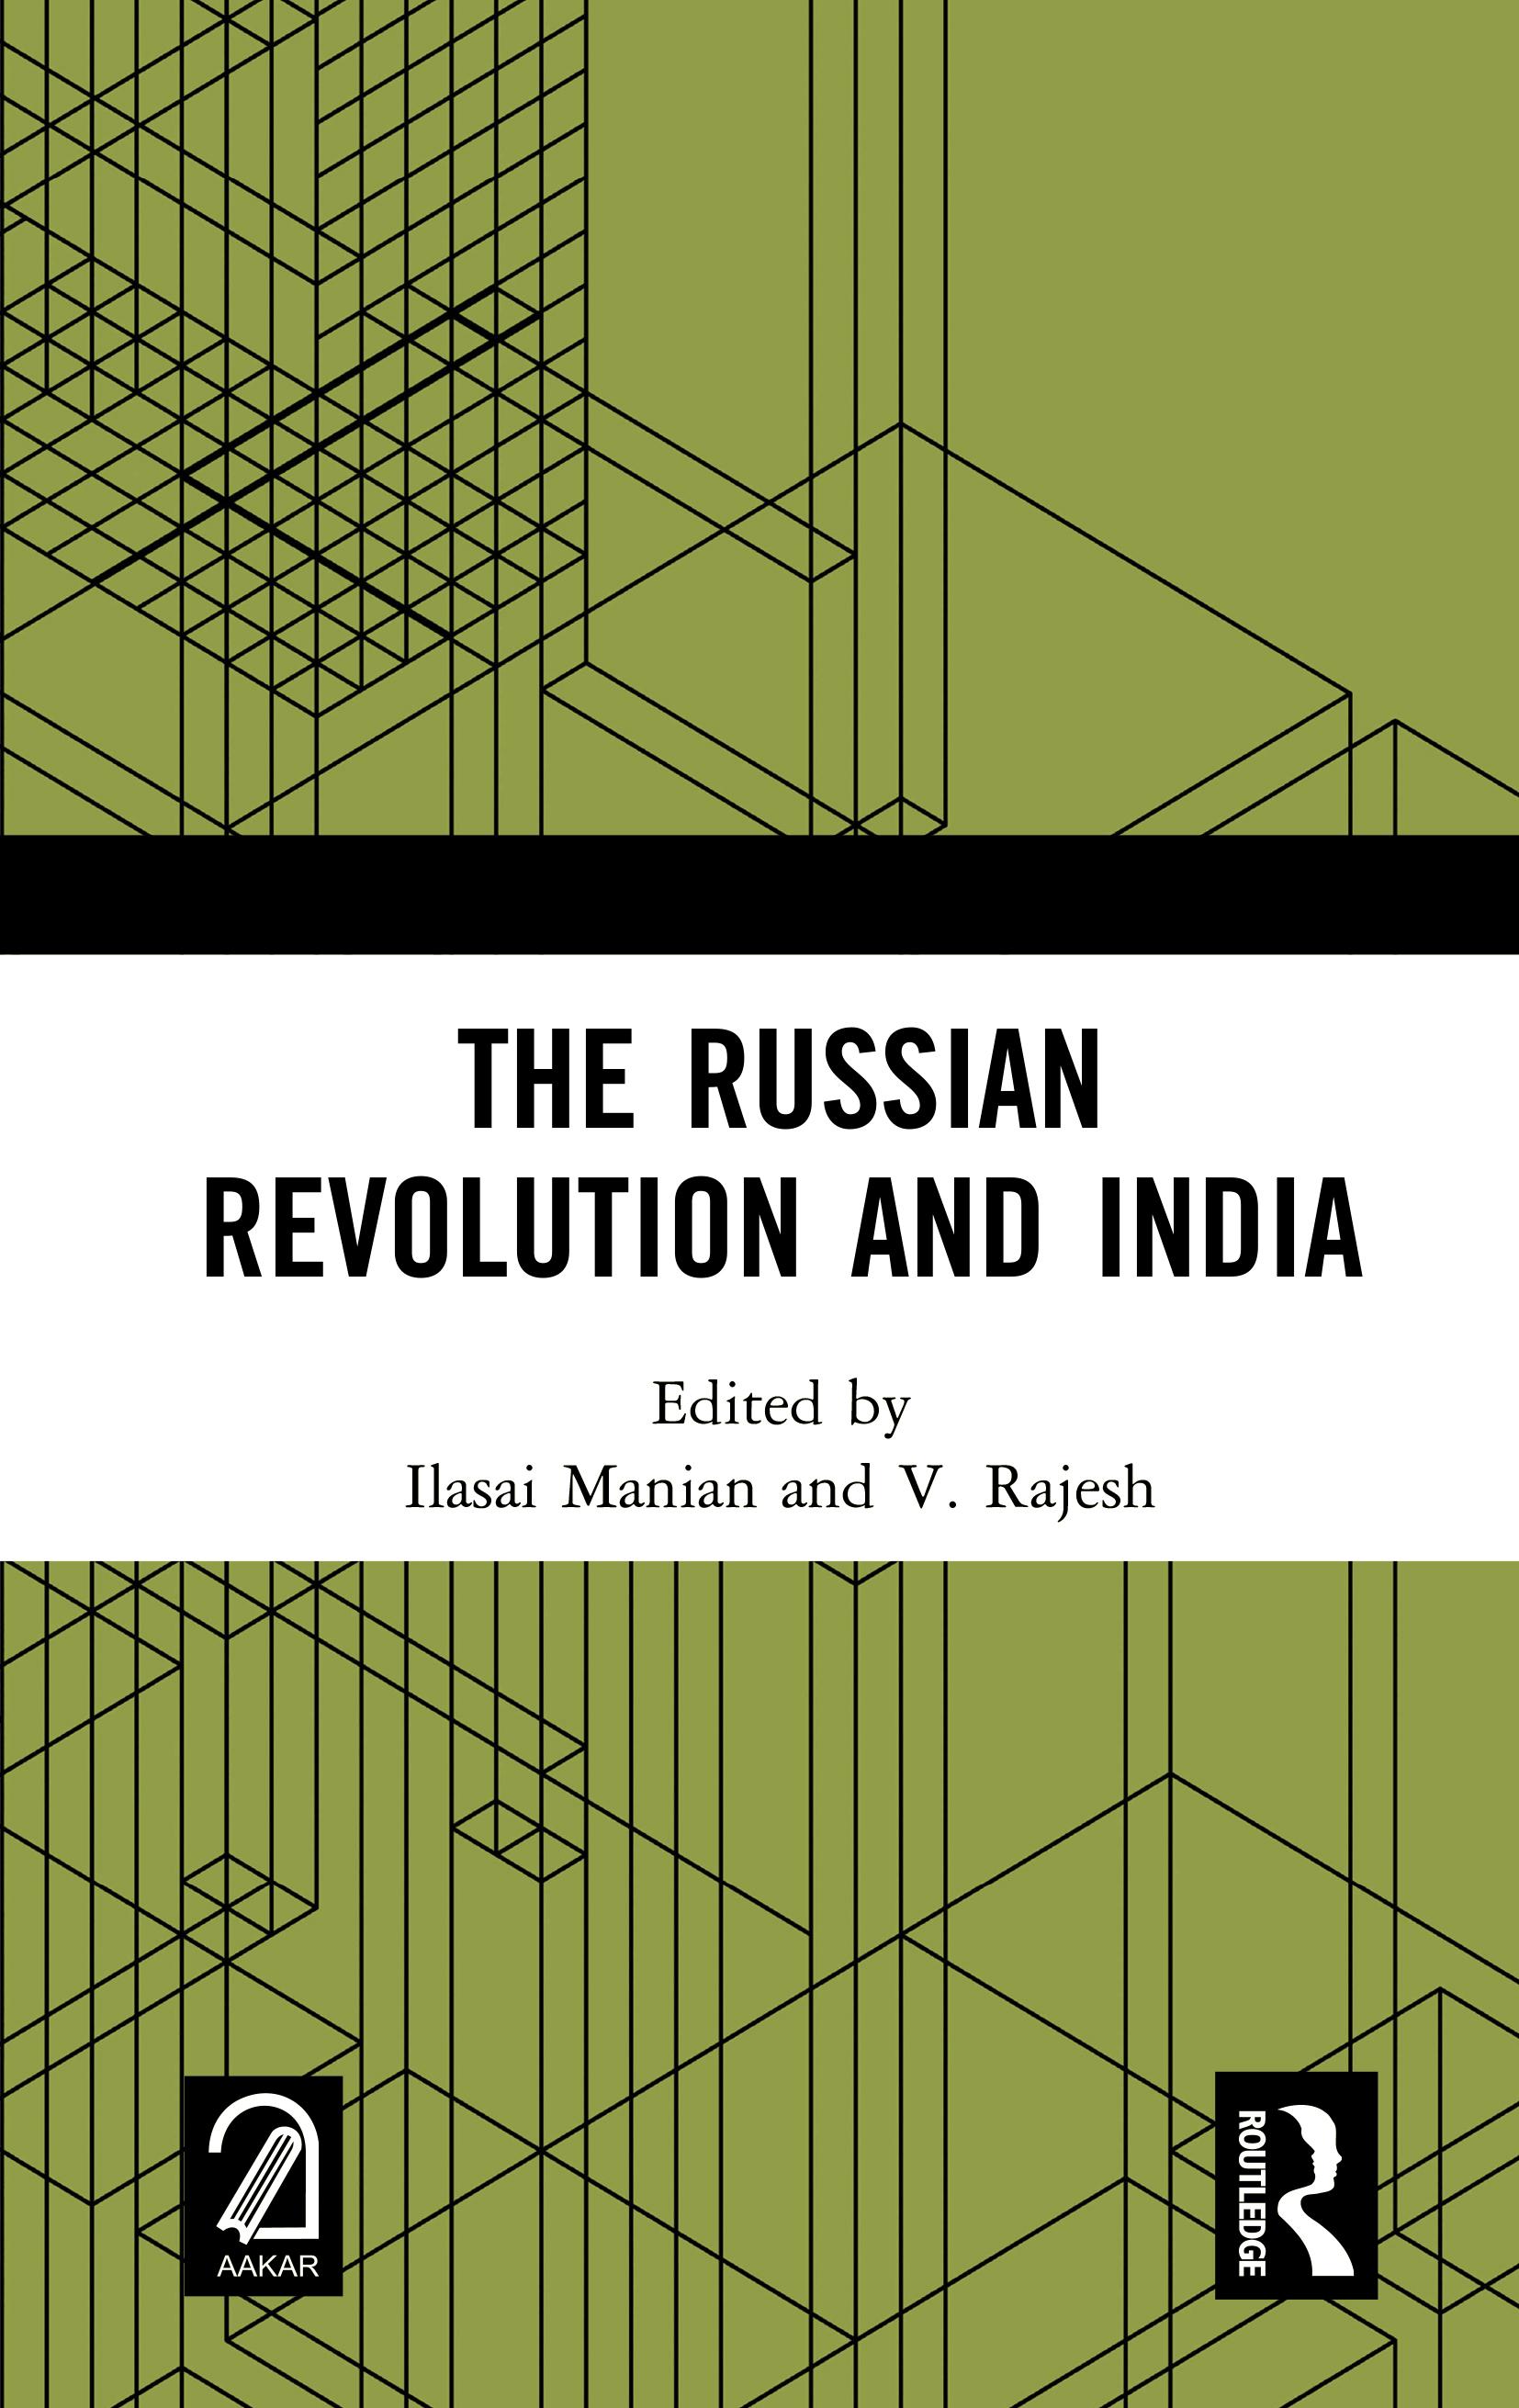 Tolstoy, Gandhi and India